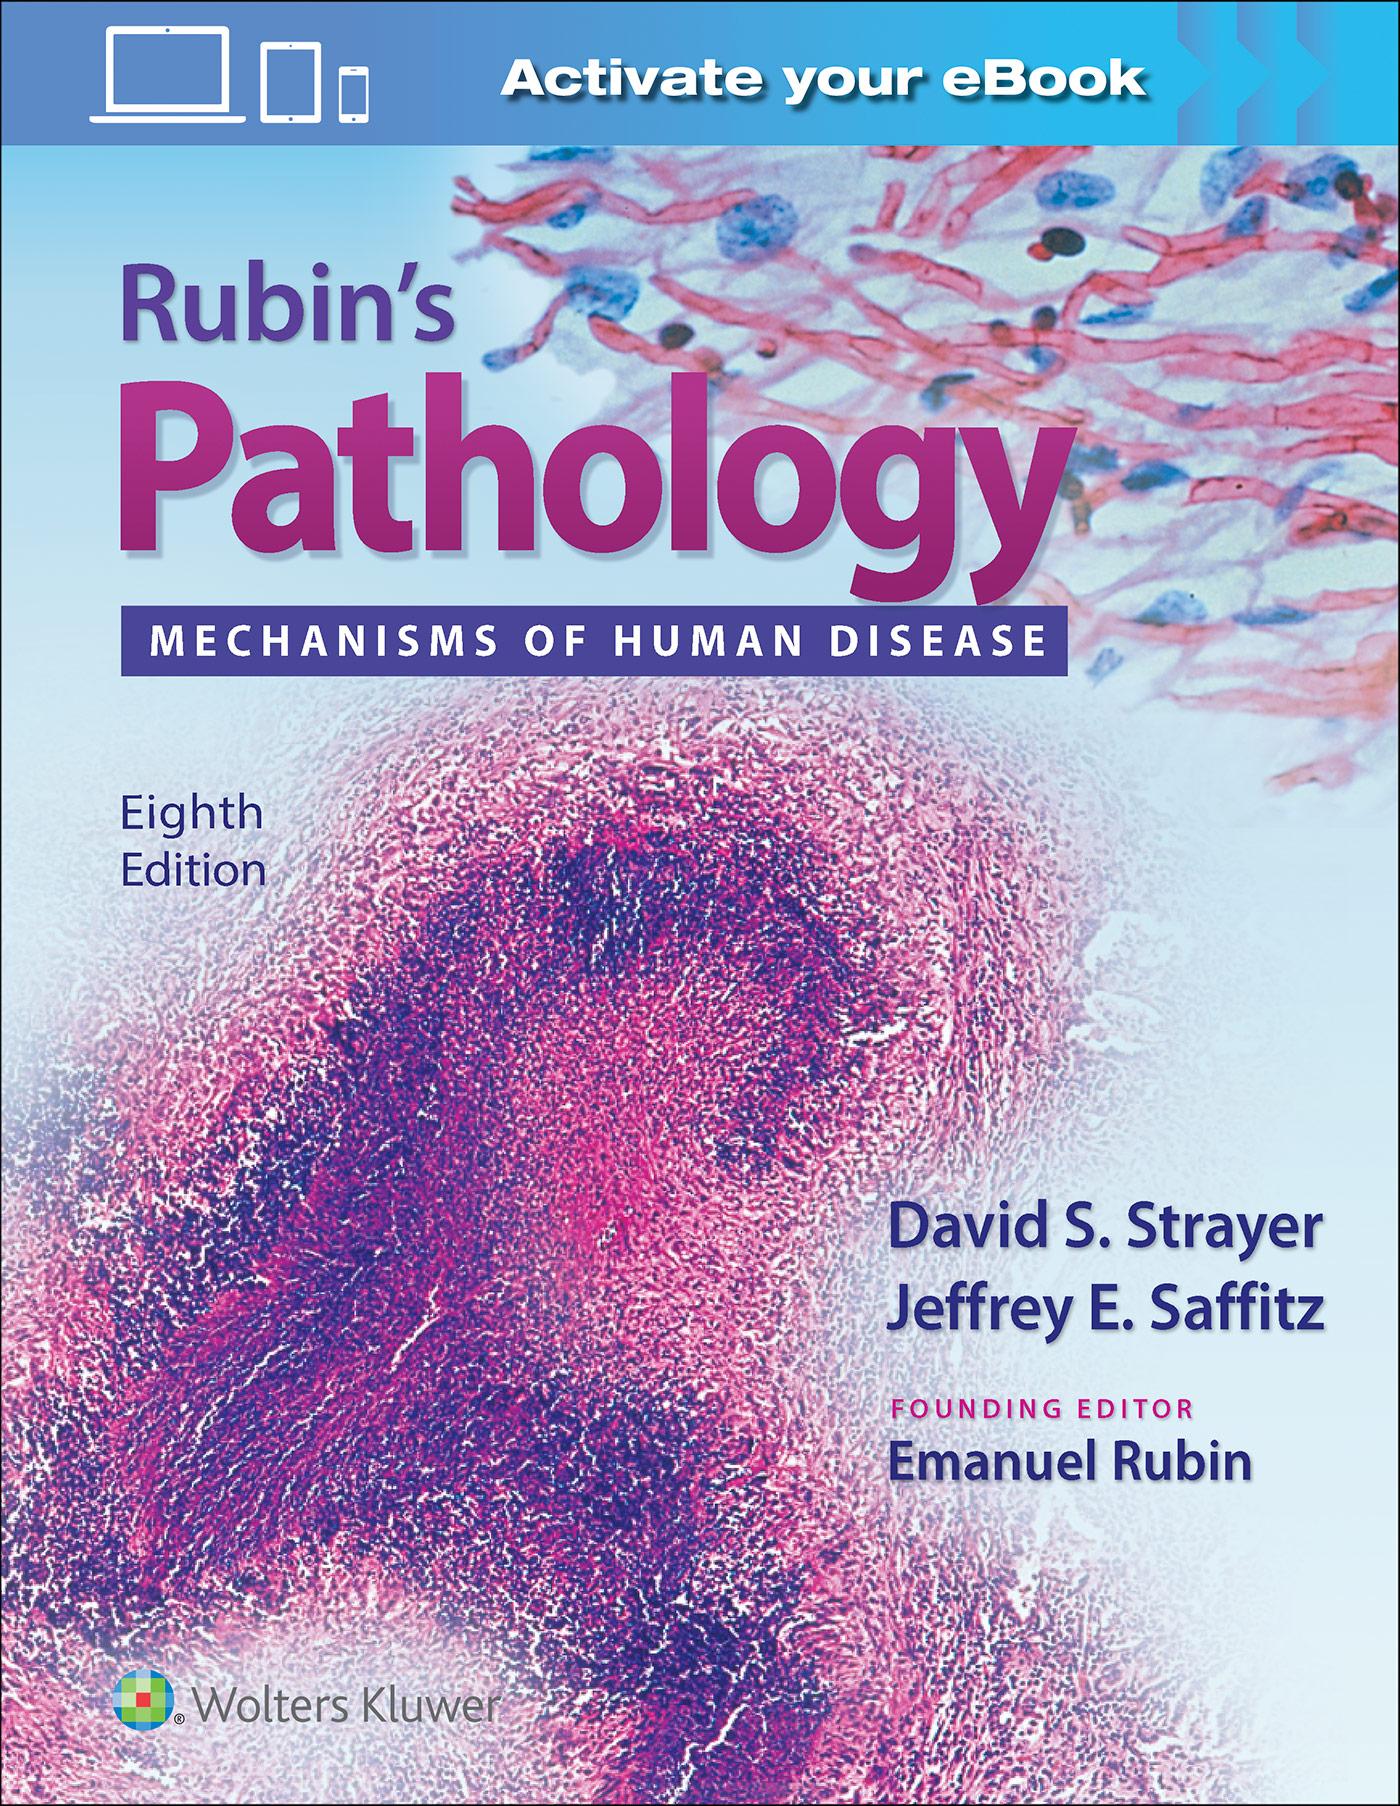 Rubin's Pathology